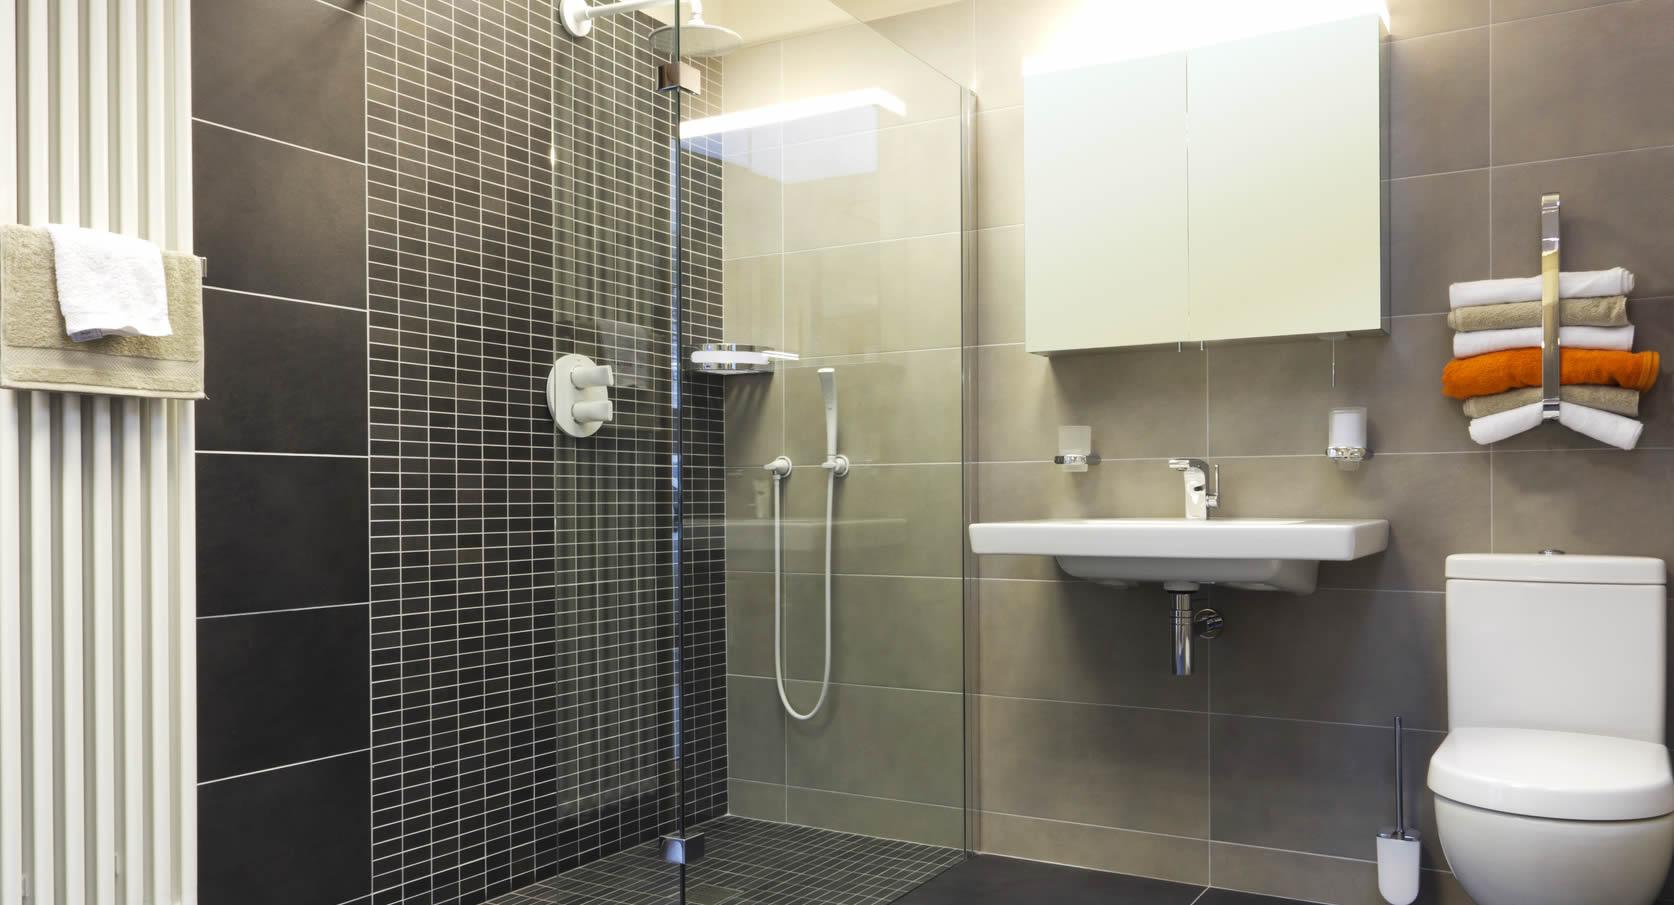 heizungswartung buderus wartung heizung und sanit r hannover. Black Bedroom Furniture Sets. Home Design Ideas